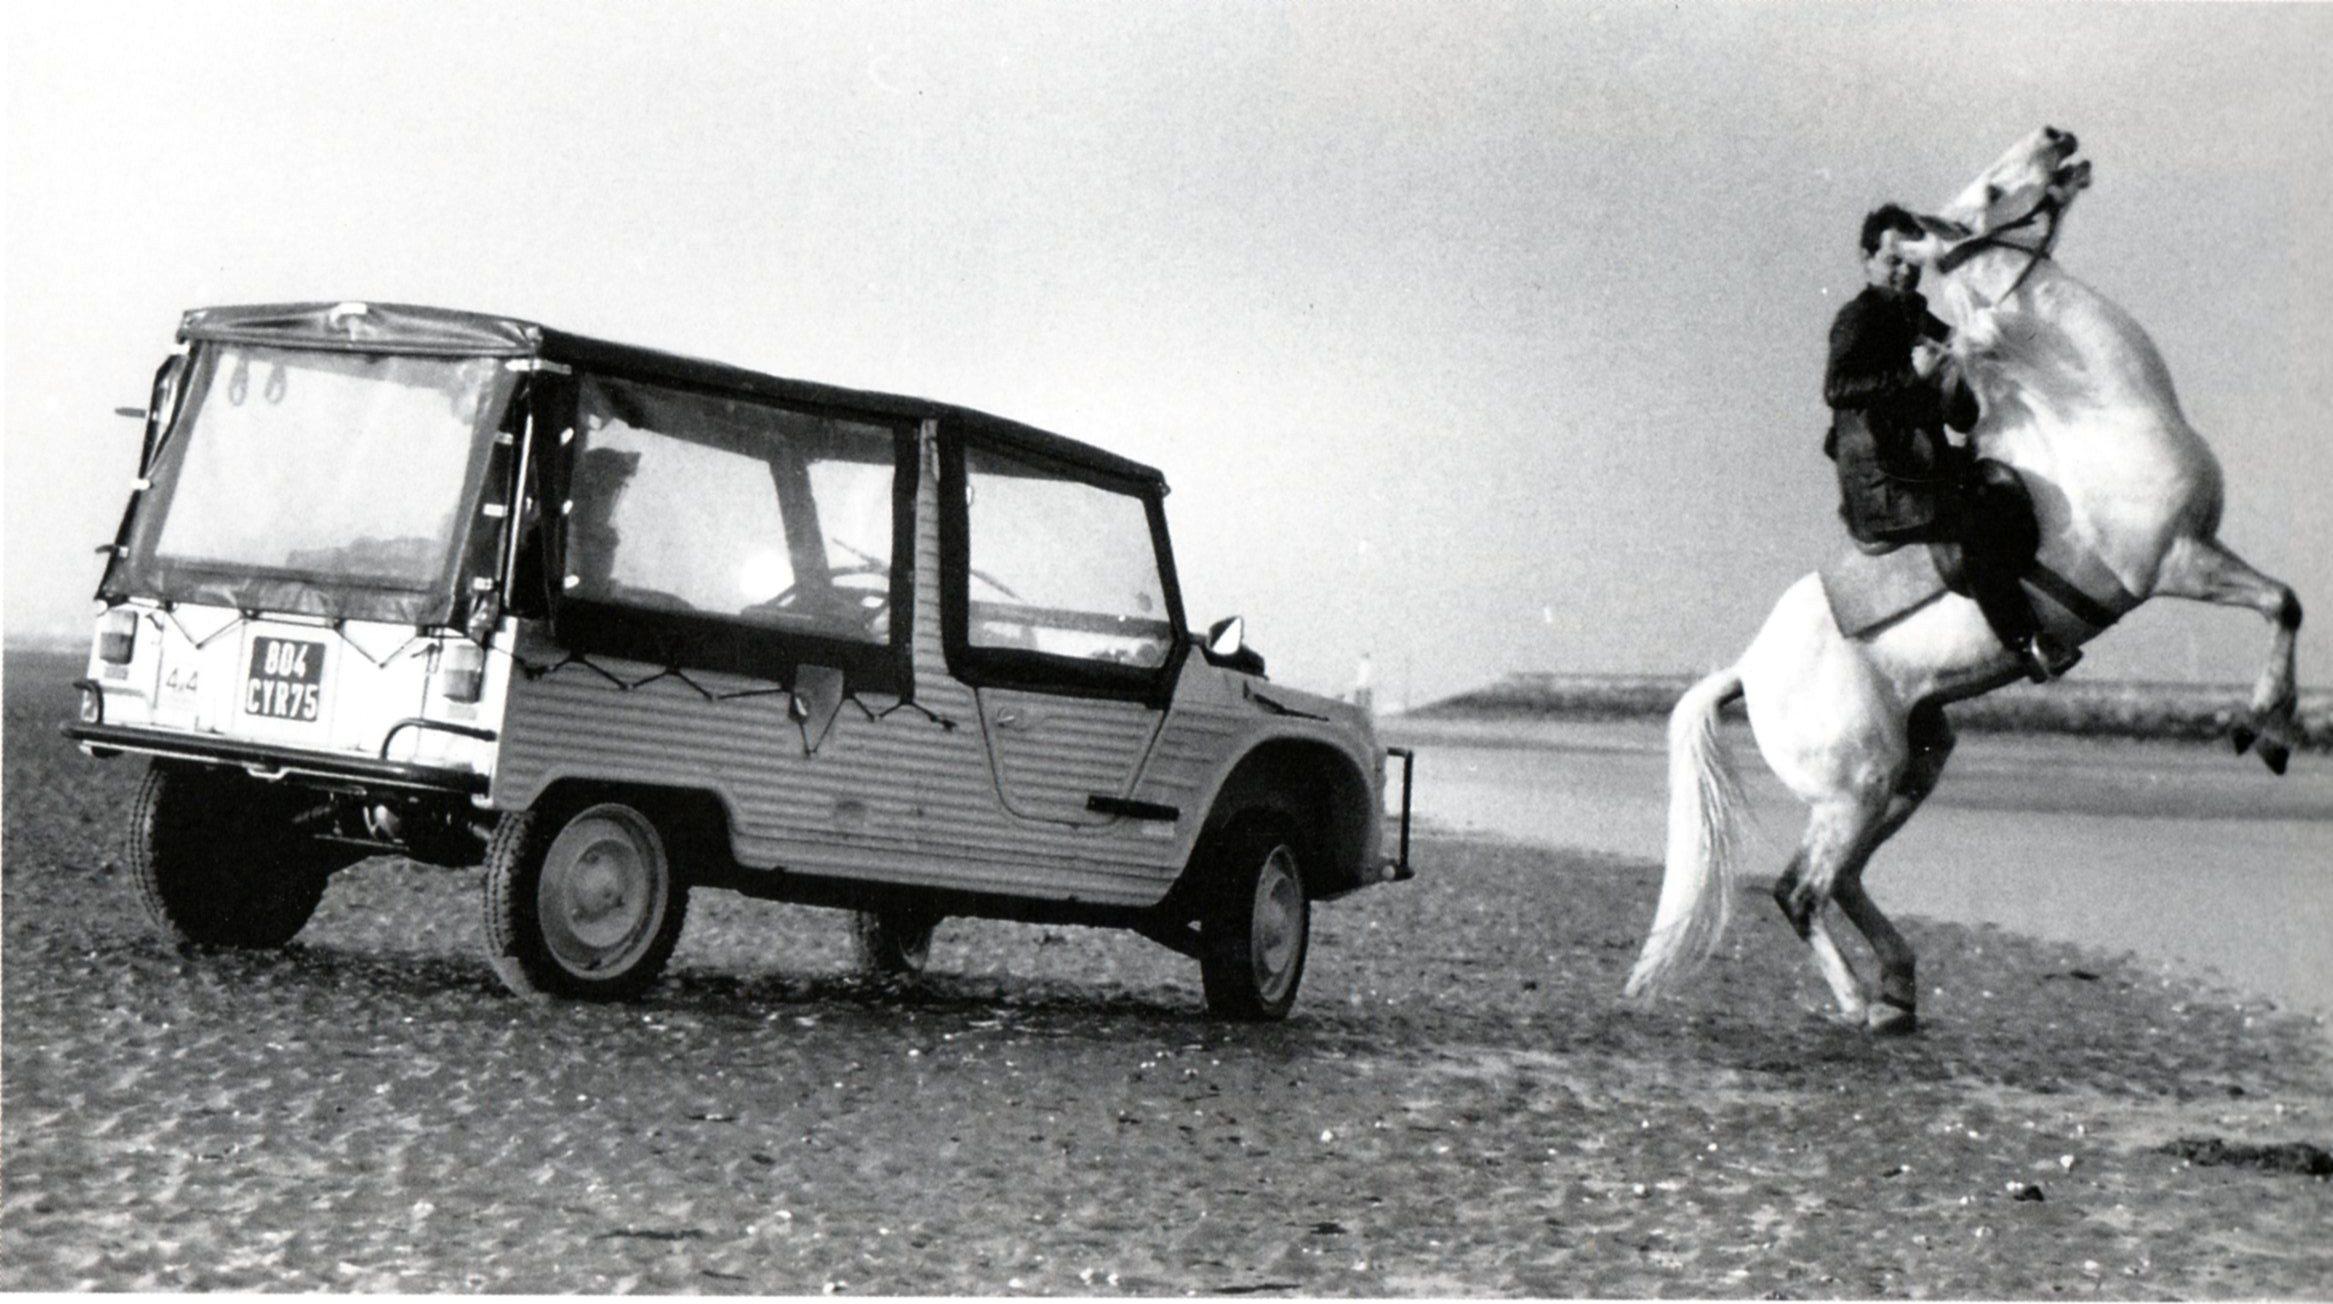 CITROEN MEHARI 4x4 prototype 1979